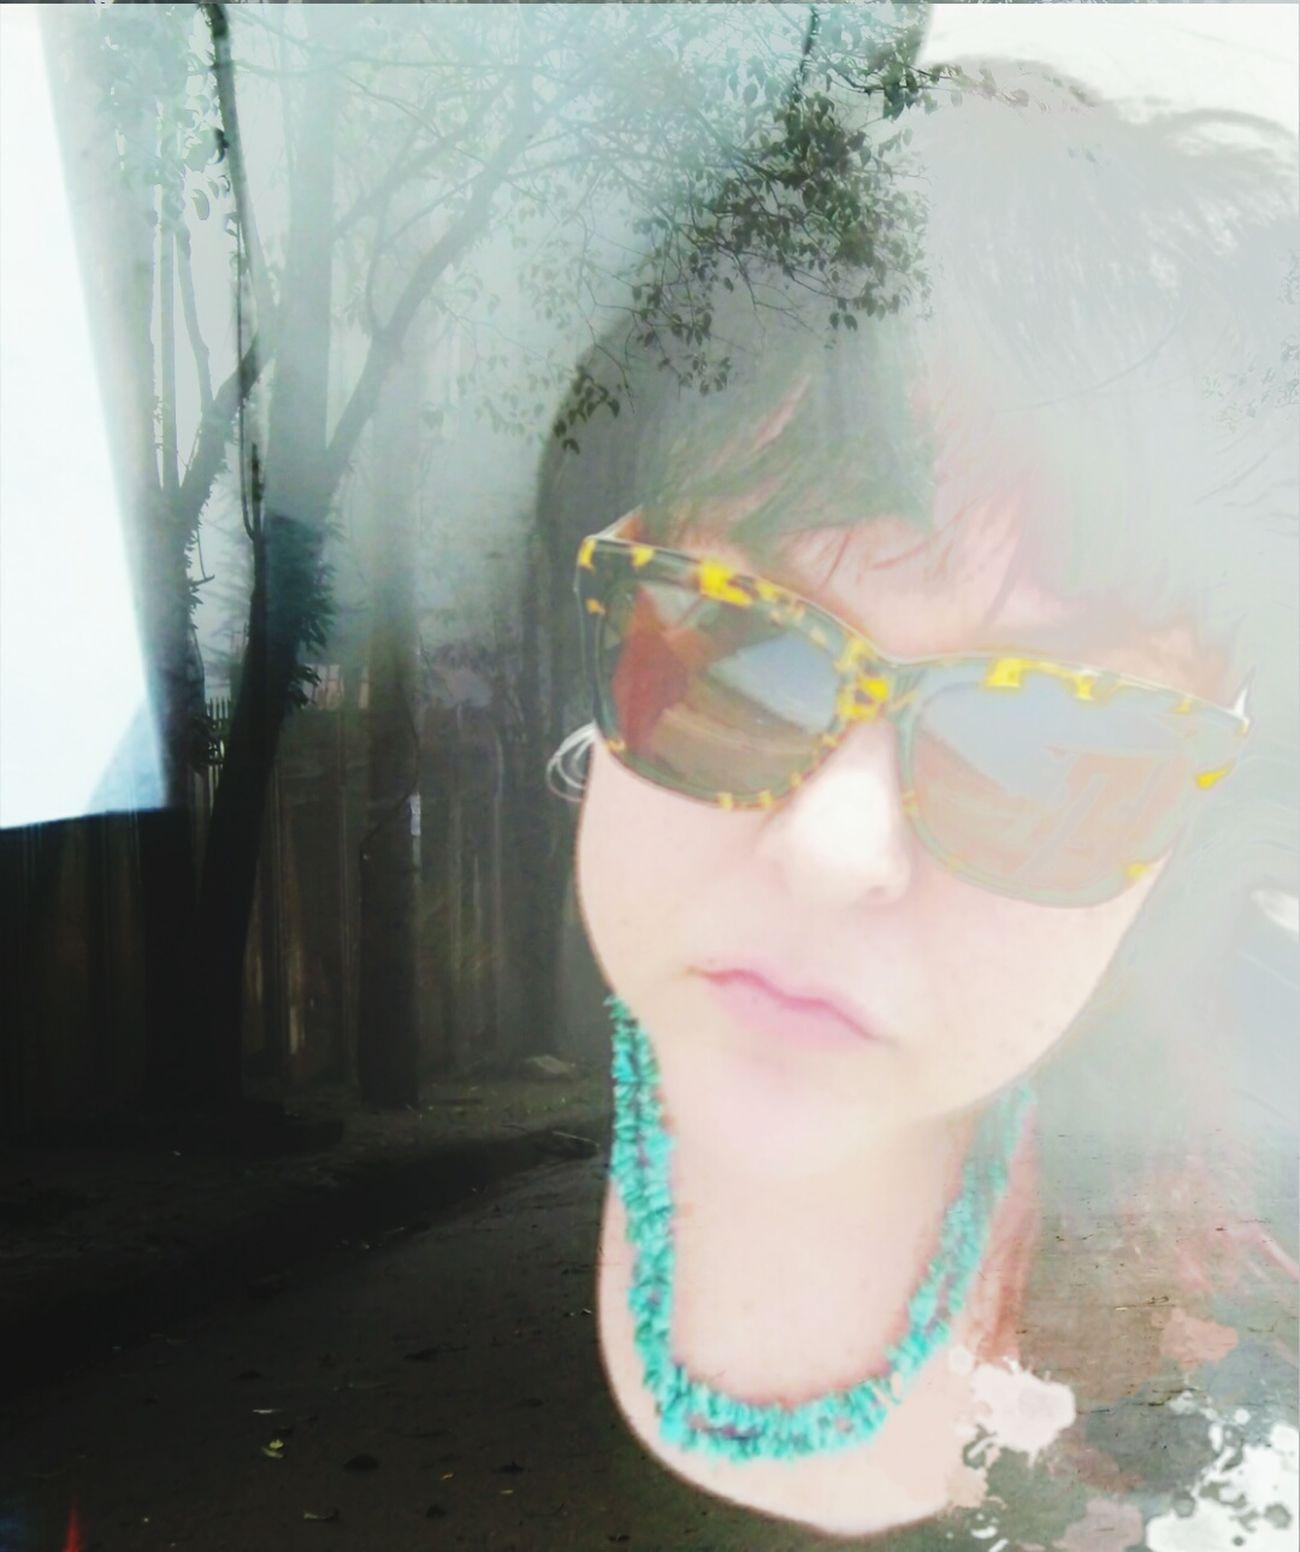 Self Portrait Combined Women Who Inspire You Selfie Saturday Daydream